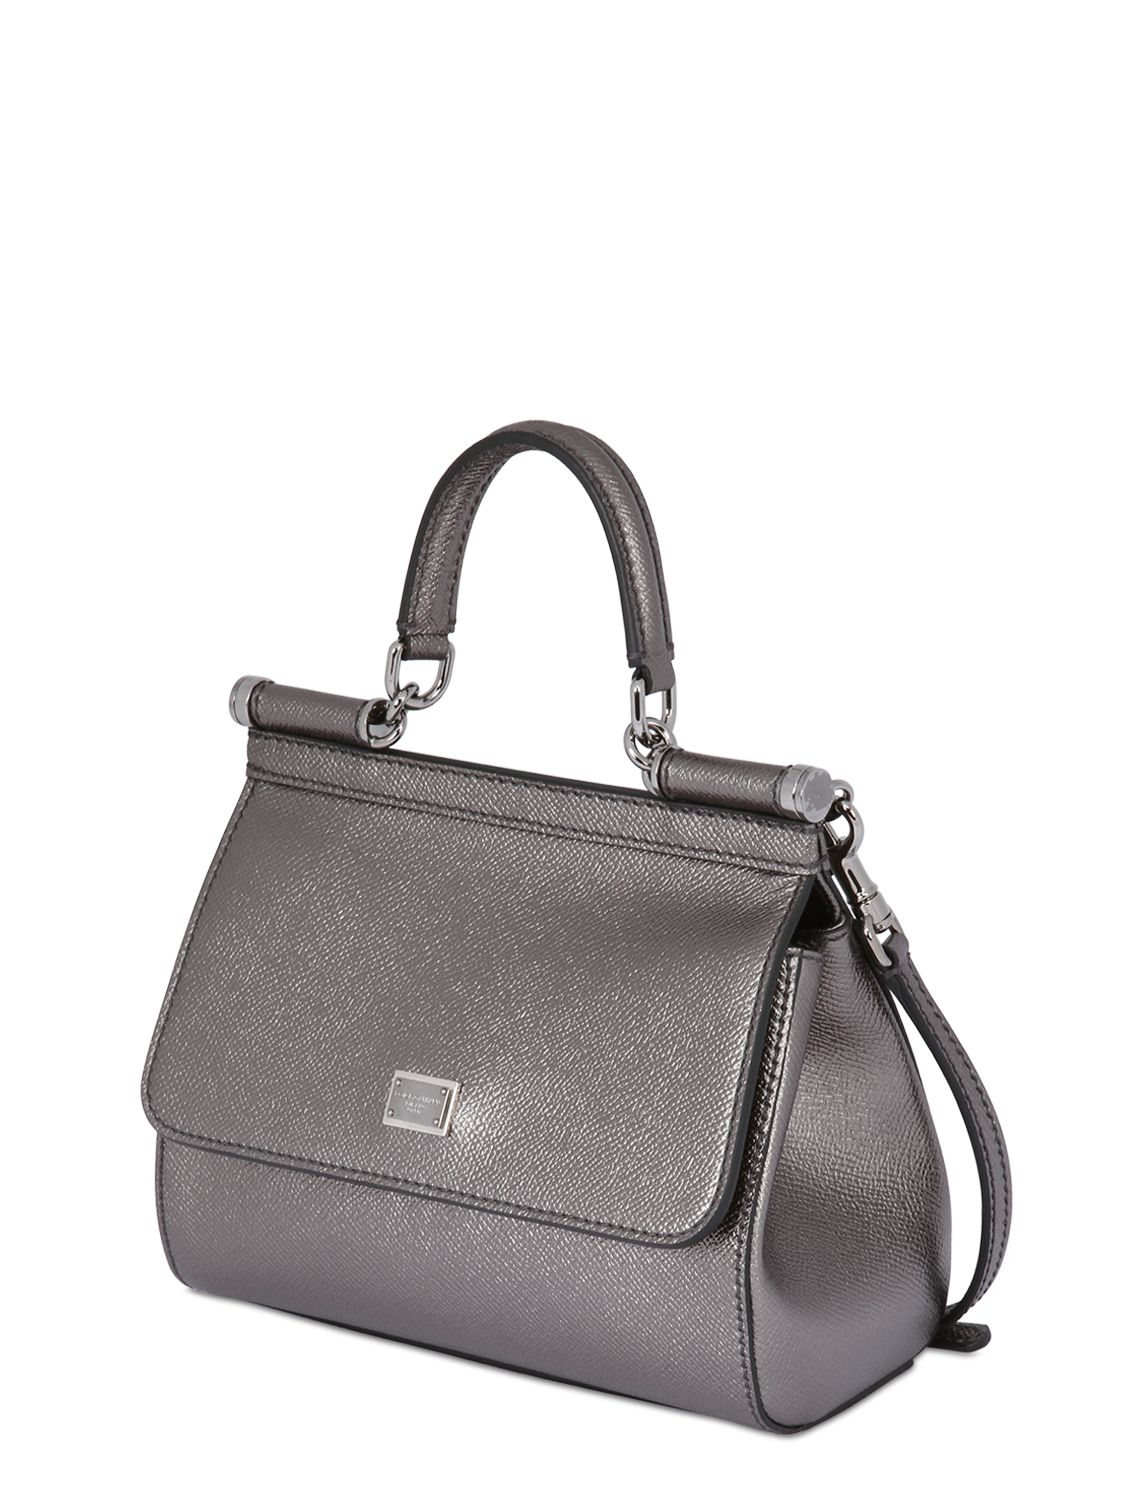 554c8e7545de Lyst - Dolce   Gabbana Small Sicily Lamé Dauphine Leather Bag in ...